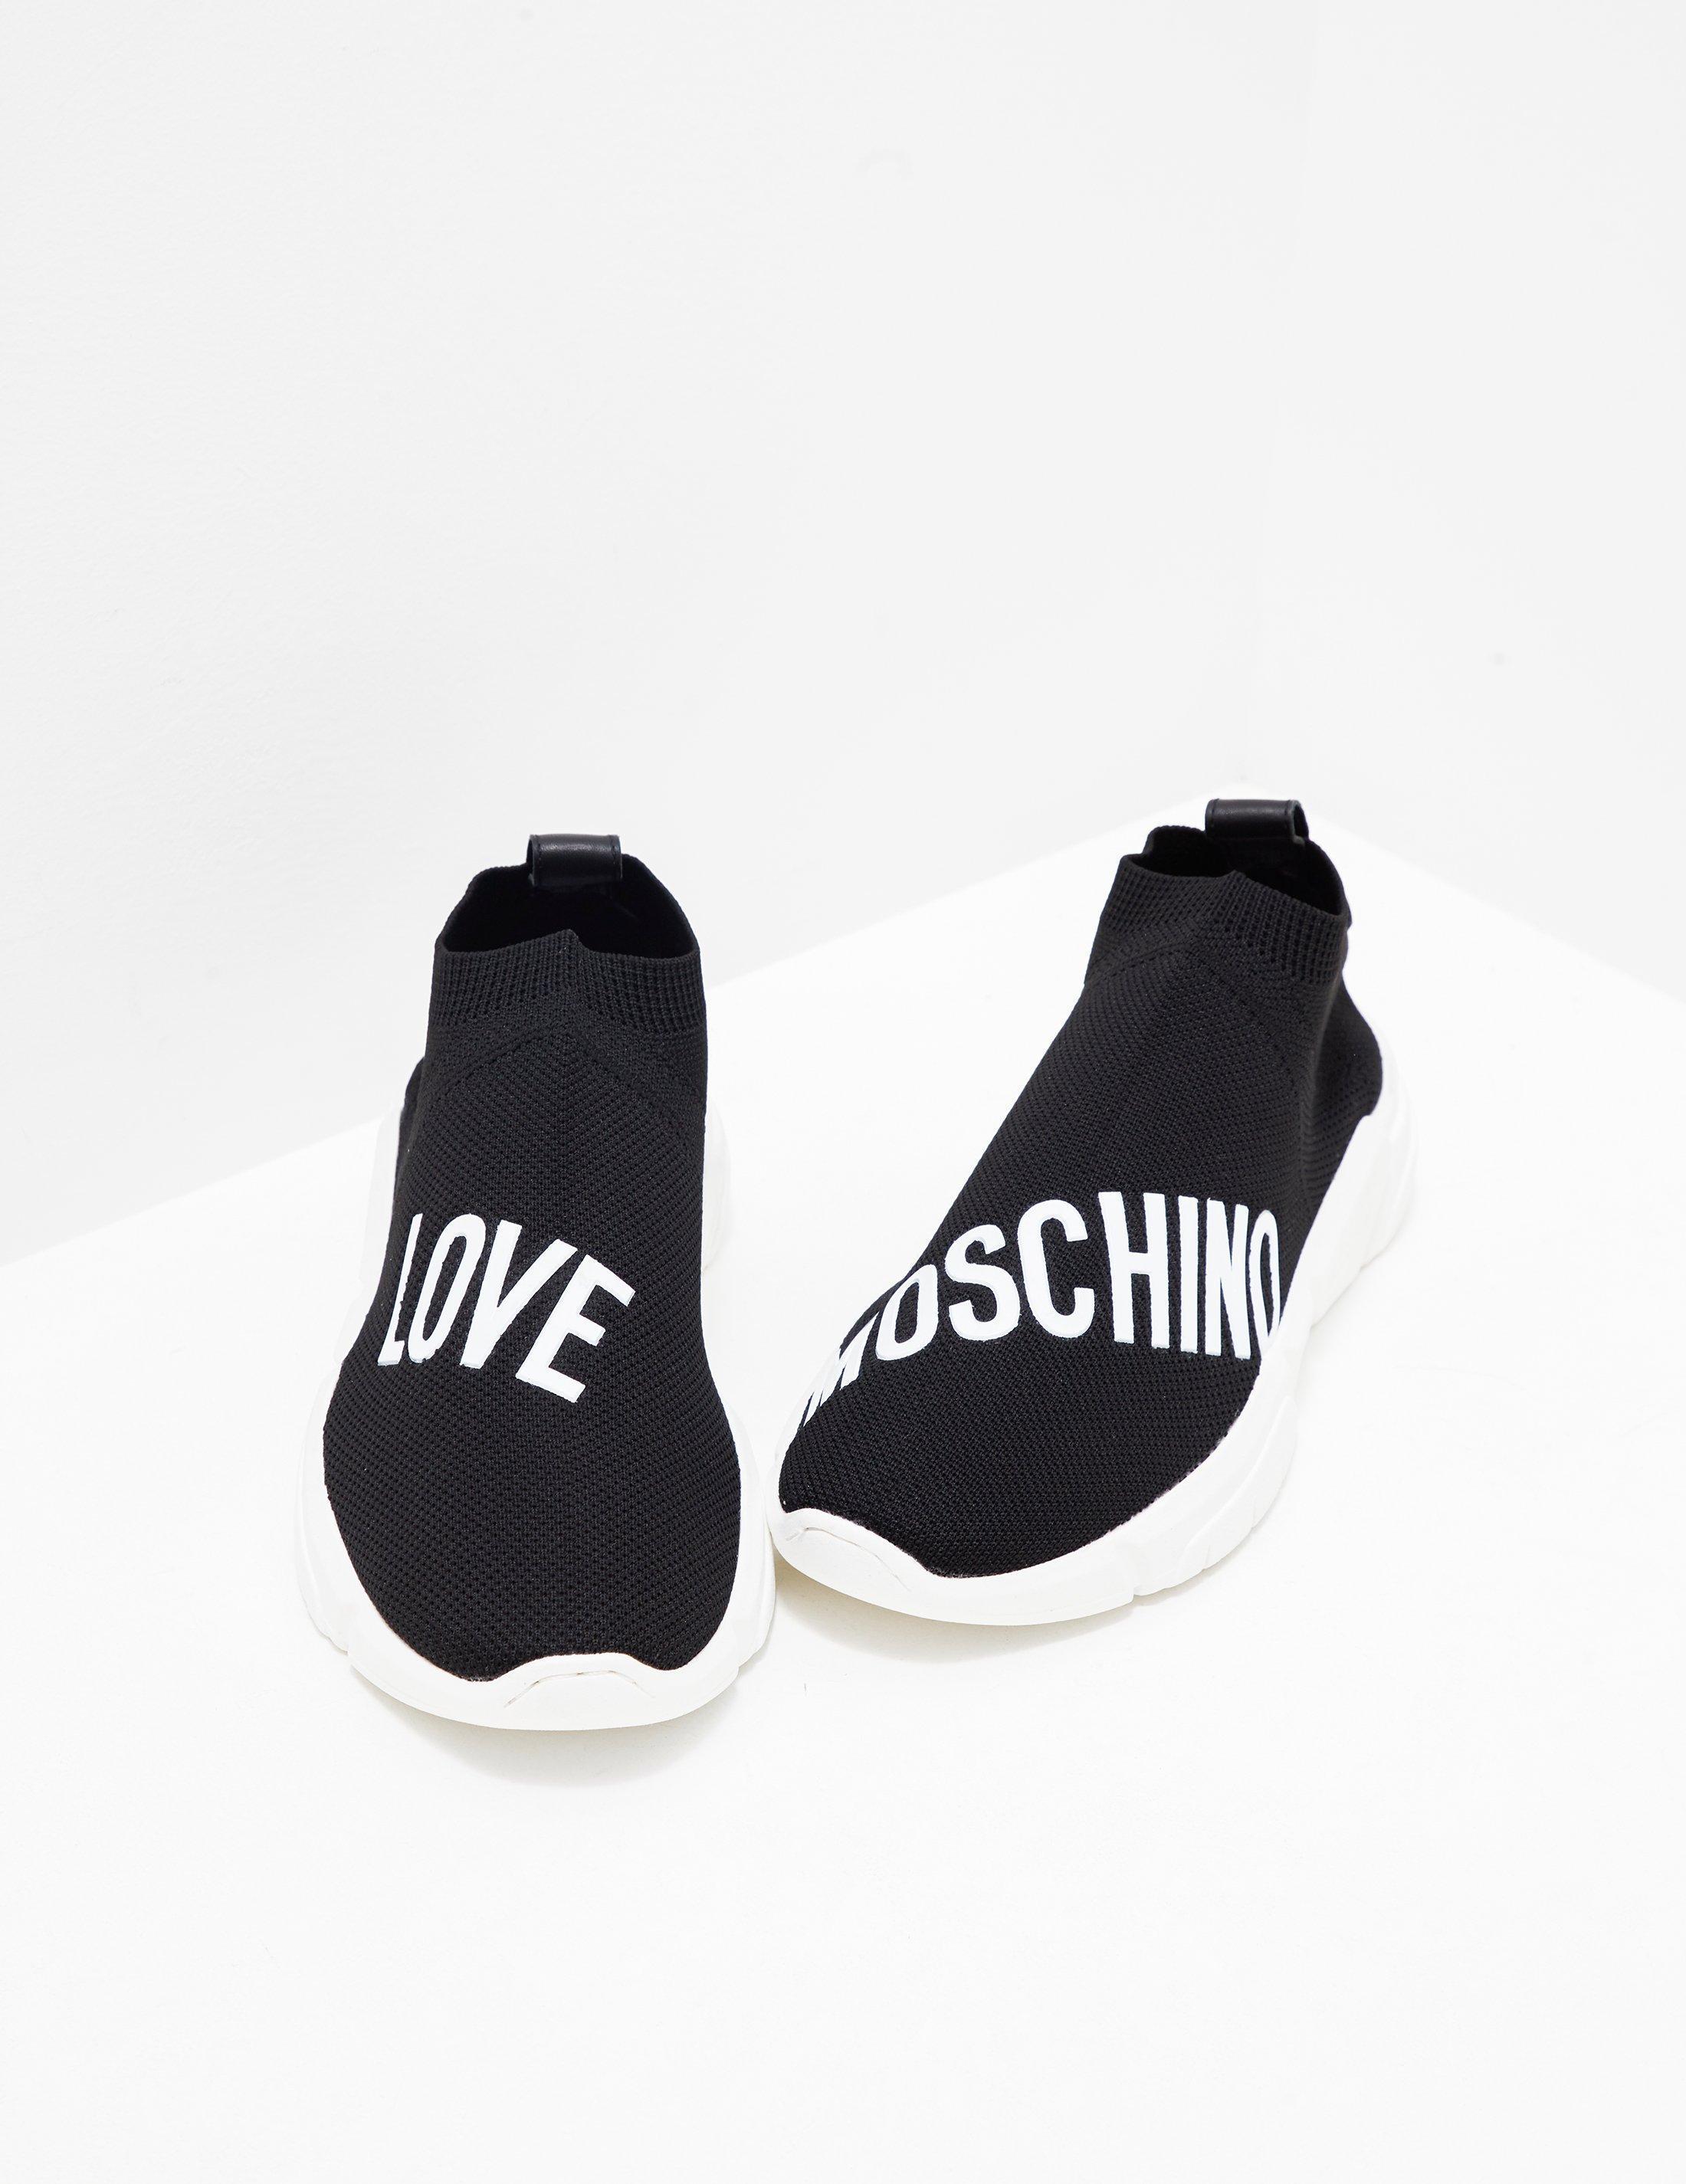 bfeae8df19 Love Moschino Womens Logo Sock Trainer Black in Black - Lyst